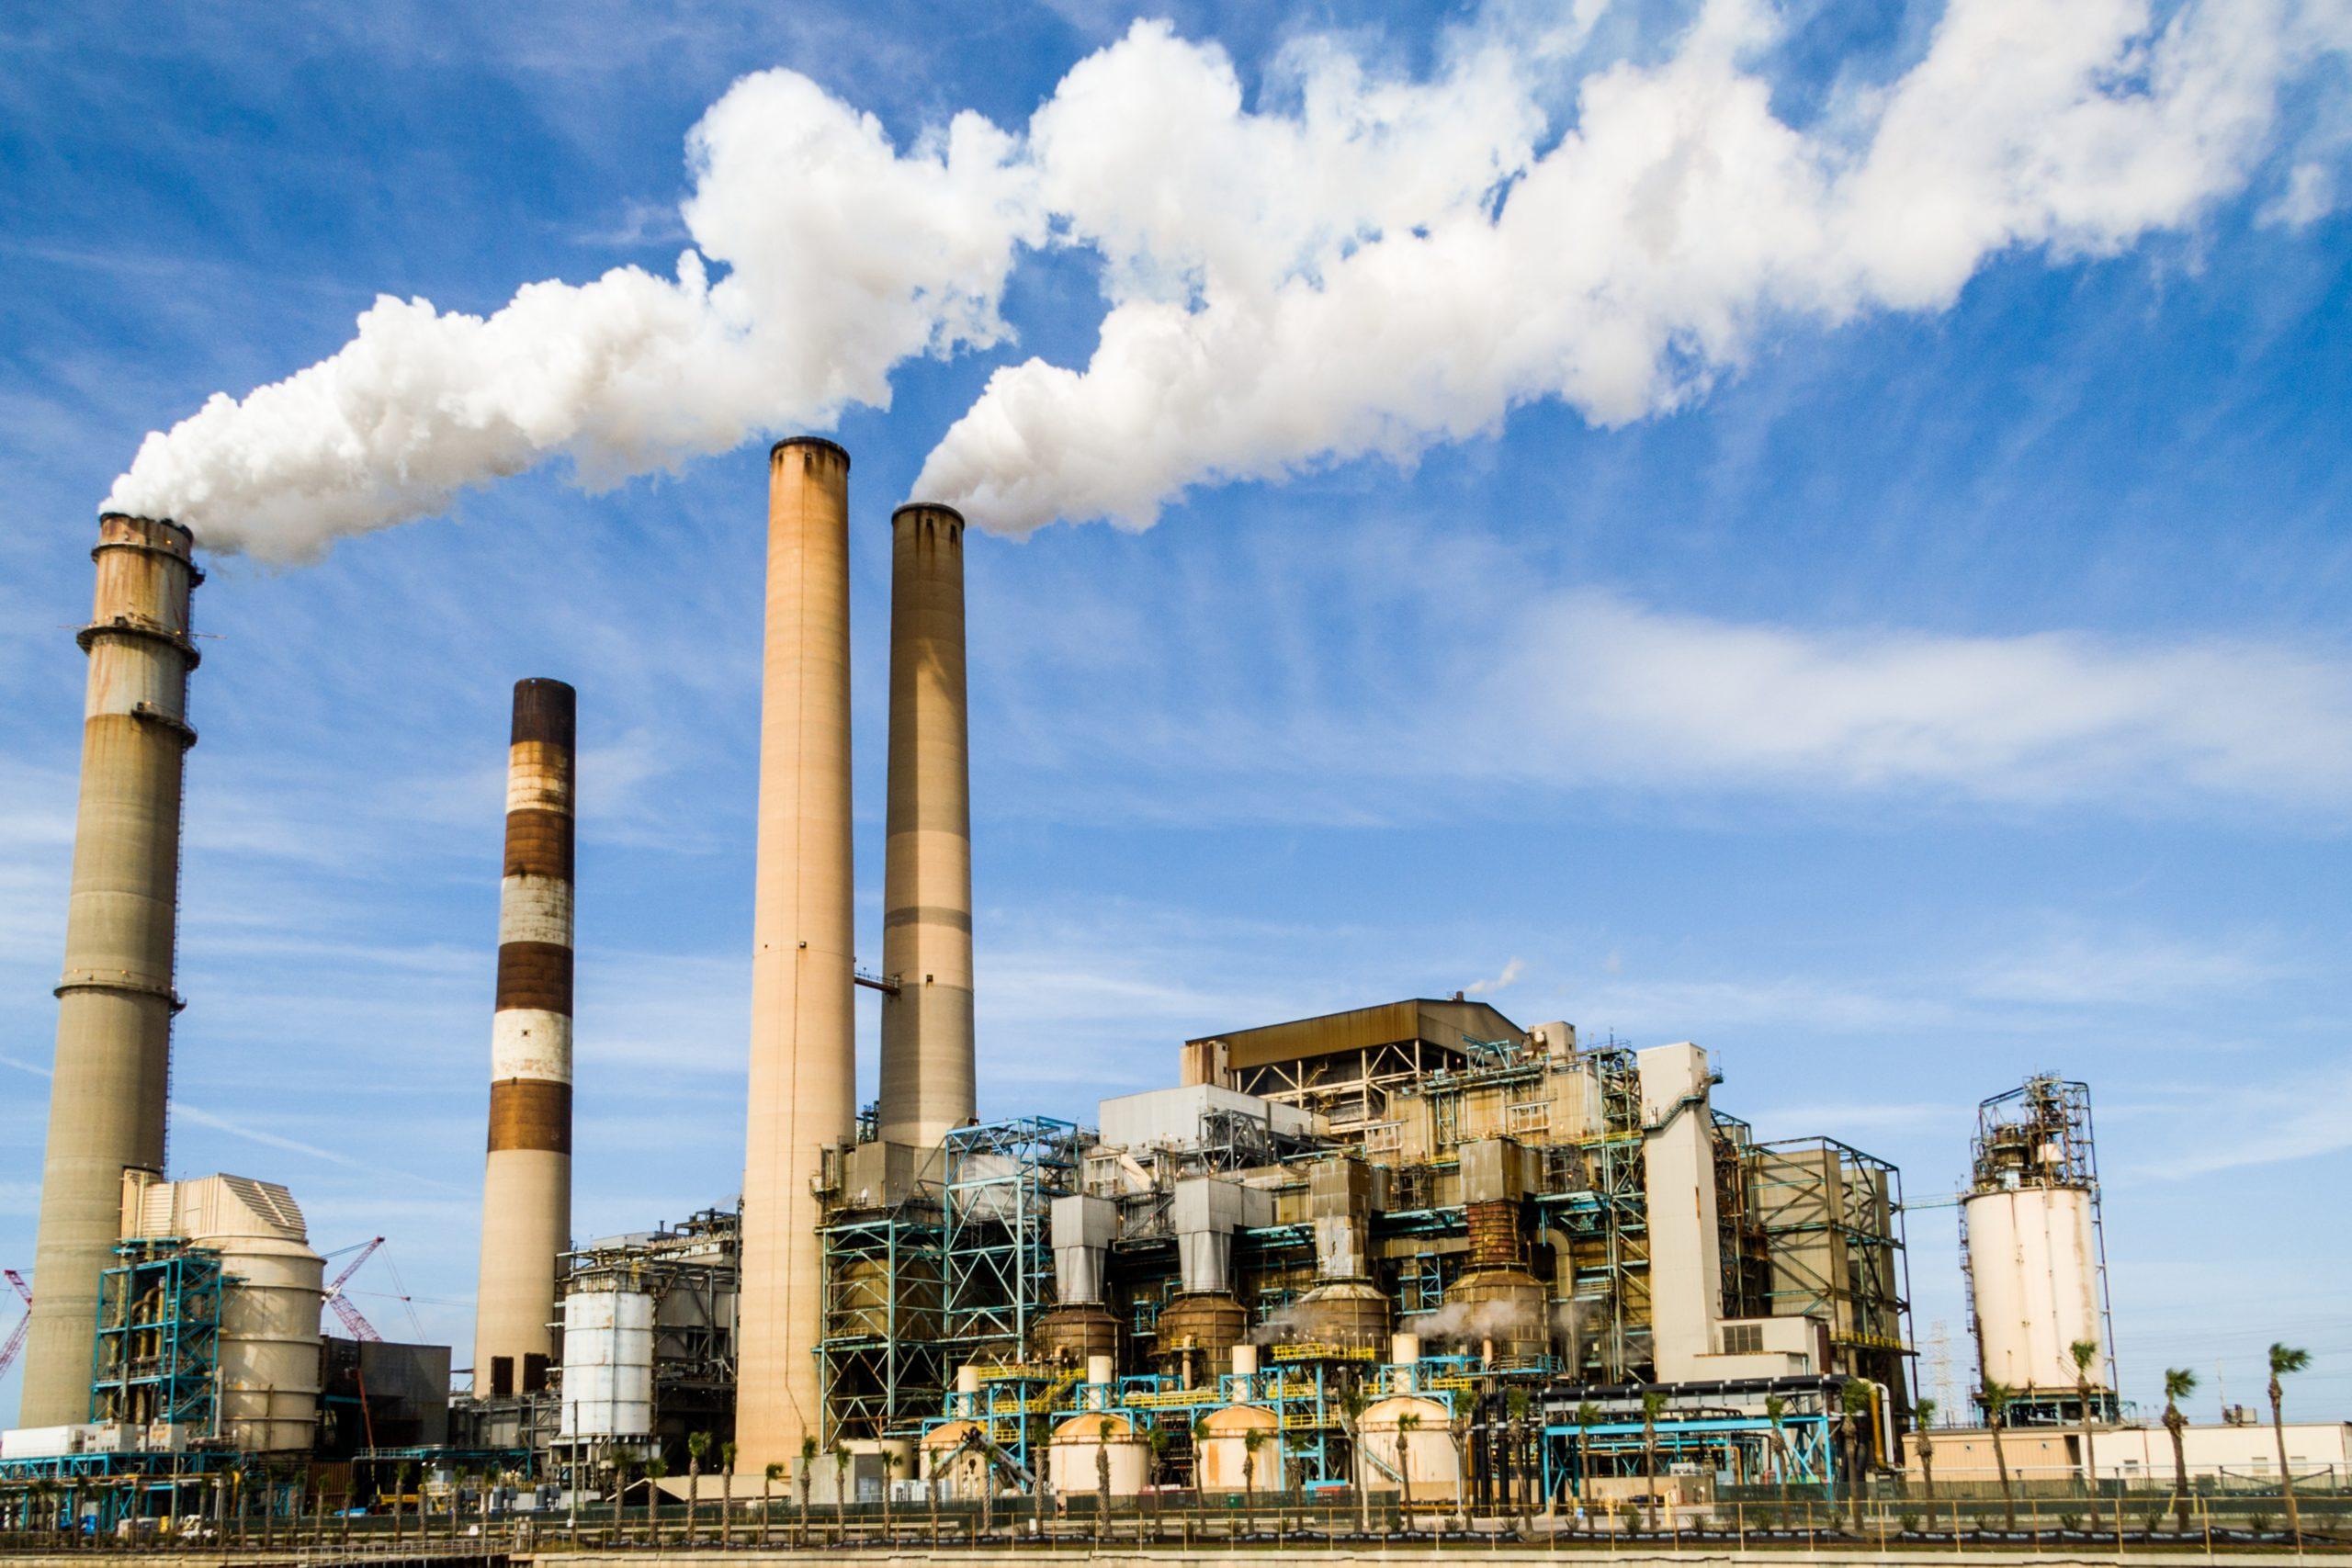 Power plant image